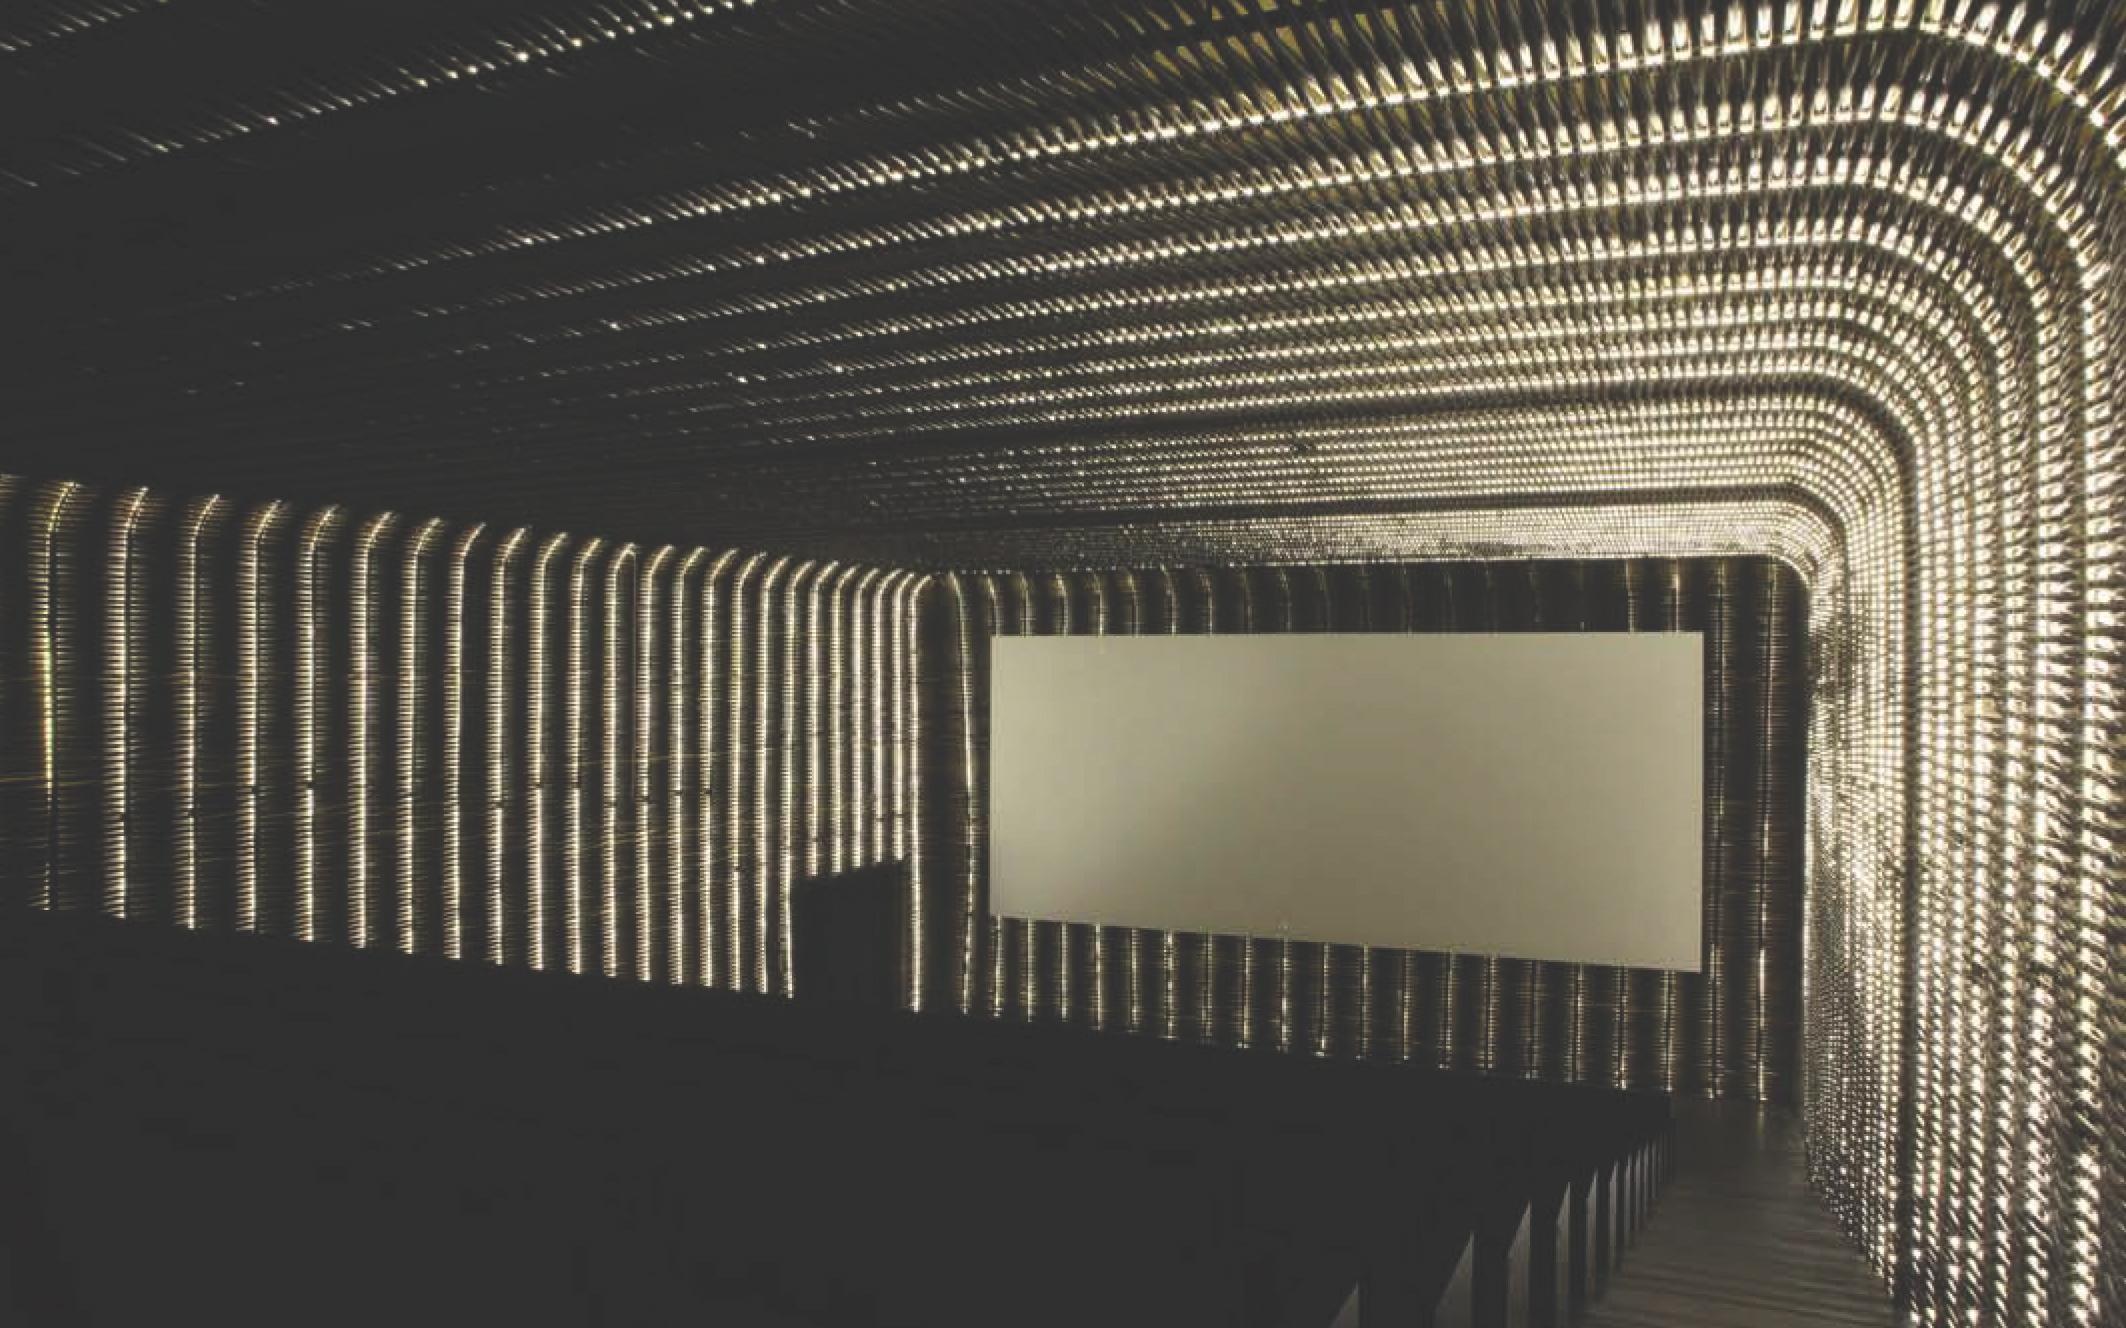 La Cineteca, una ventana a la periferia